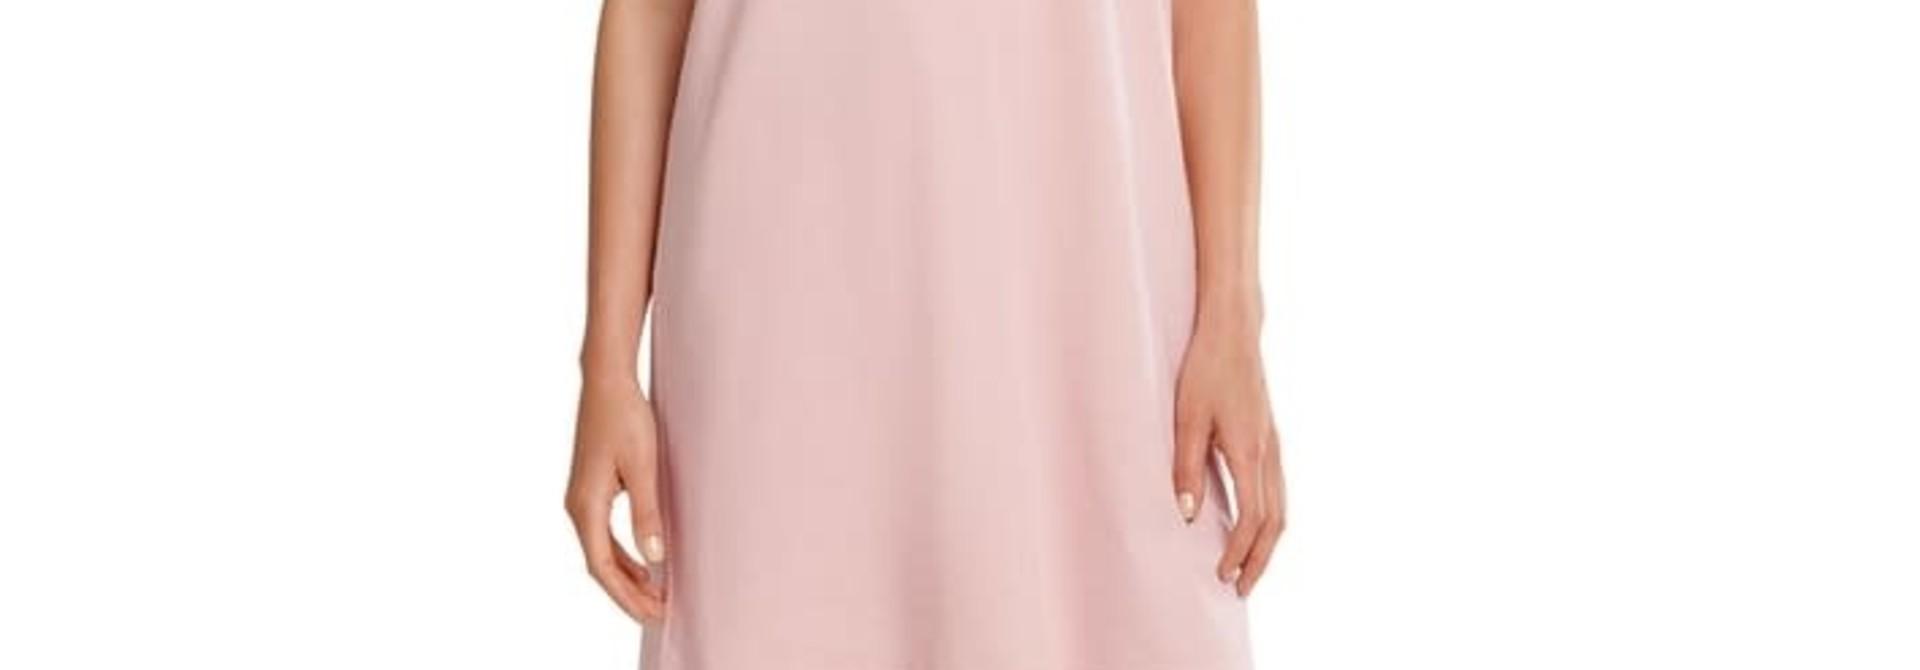 Nachthemd korte mouw 174668 - rosa